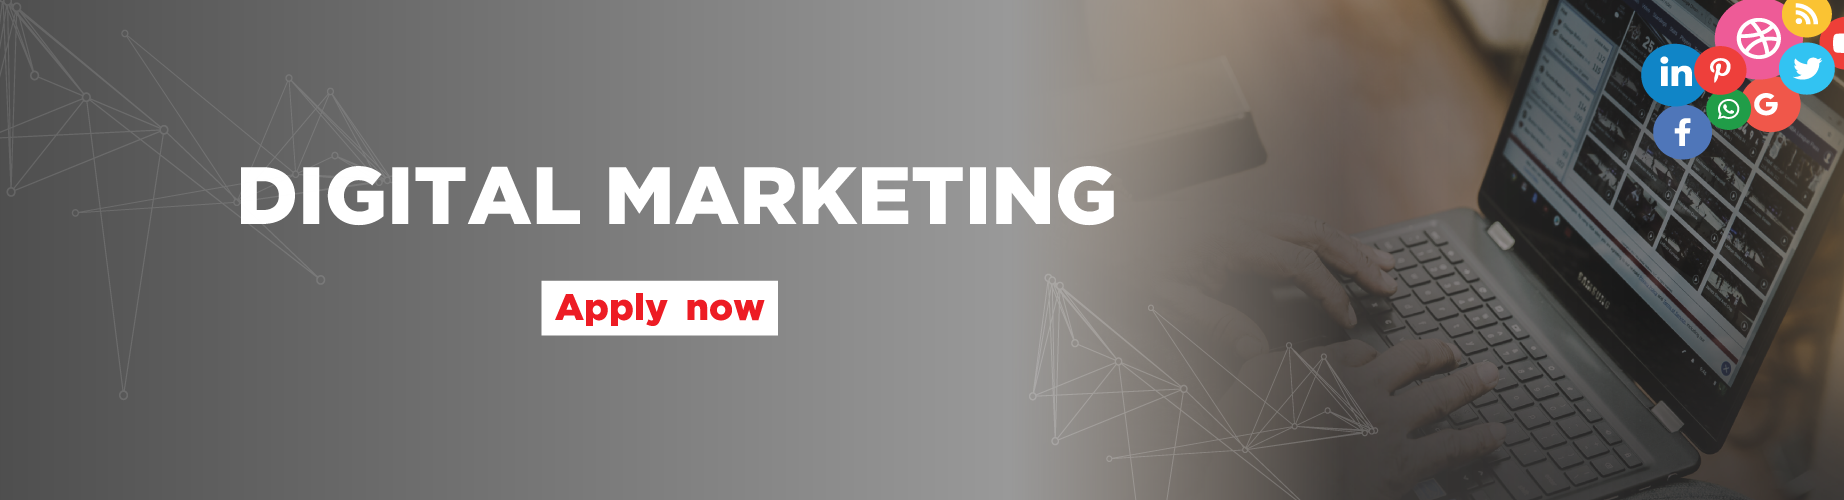 Digital-Marketing-Web-Banner